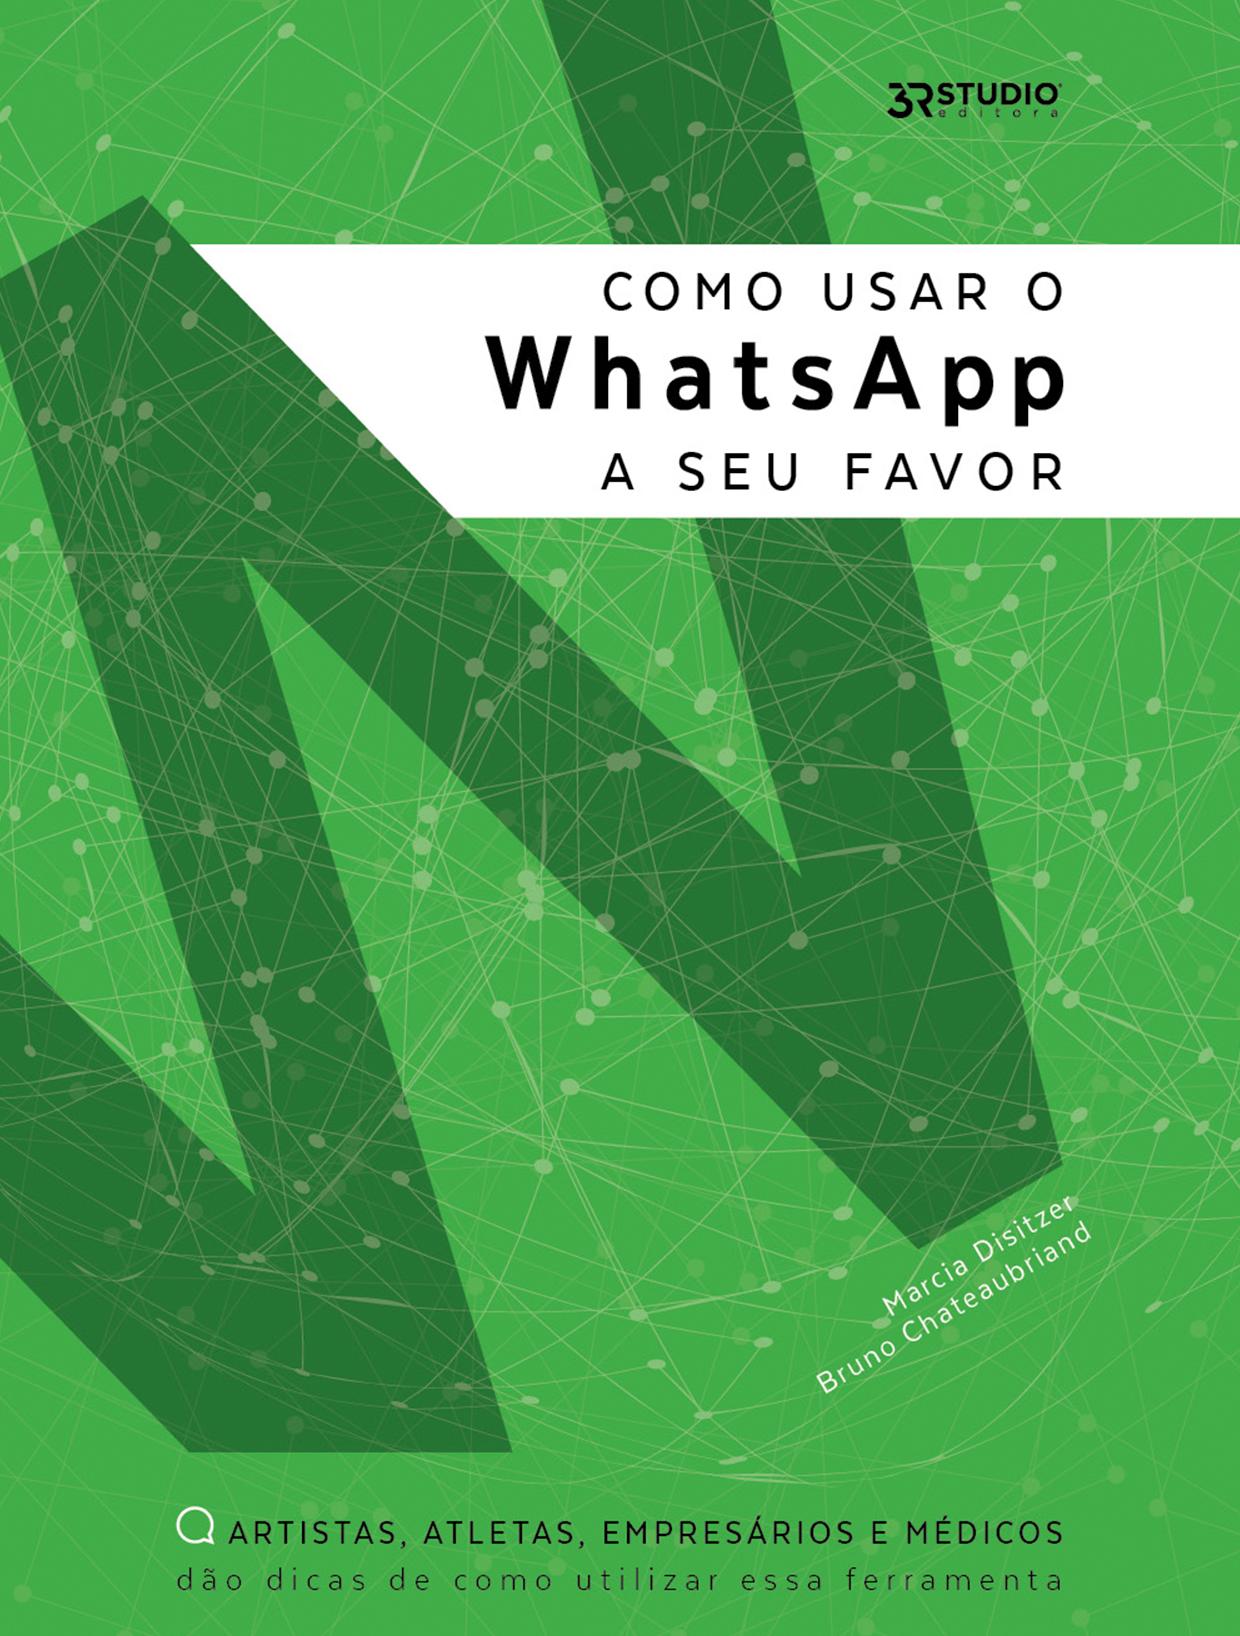 Como Usar O WhatsApp A Seu Favor – Bruno Chateaubriand E Marcia Disitzer